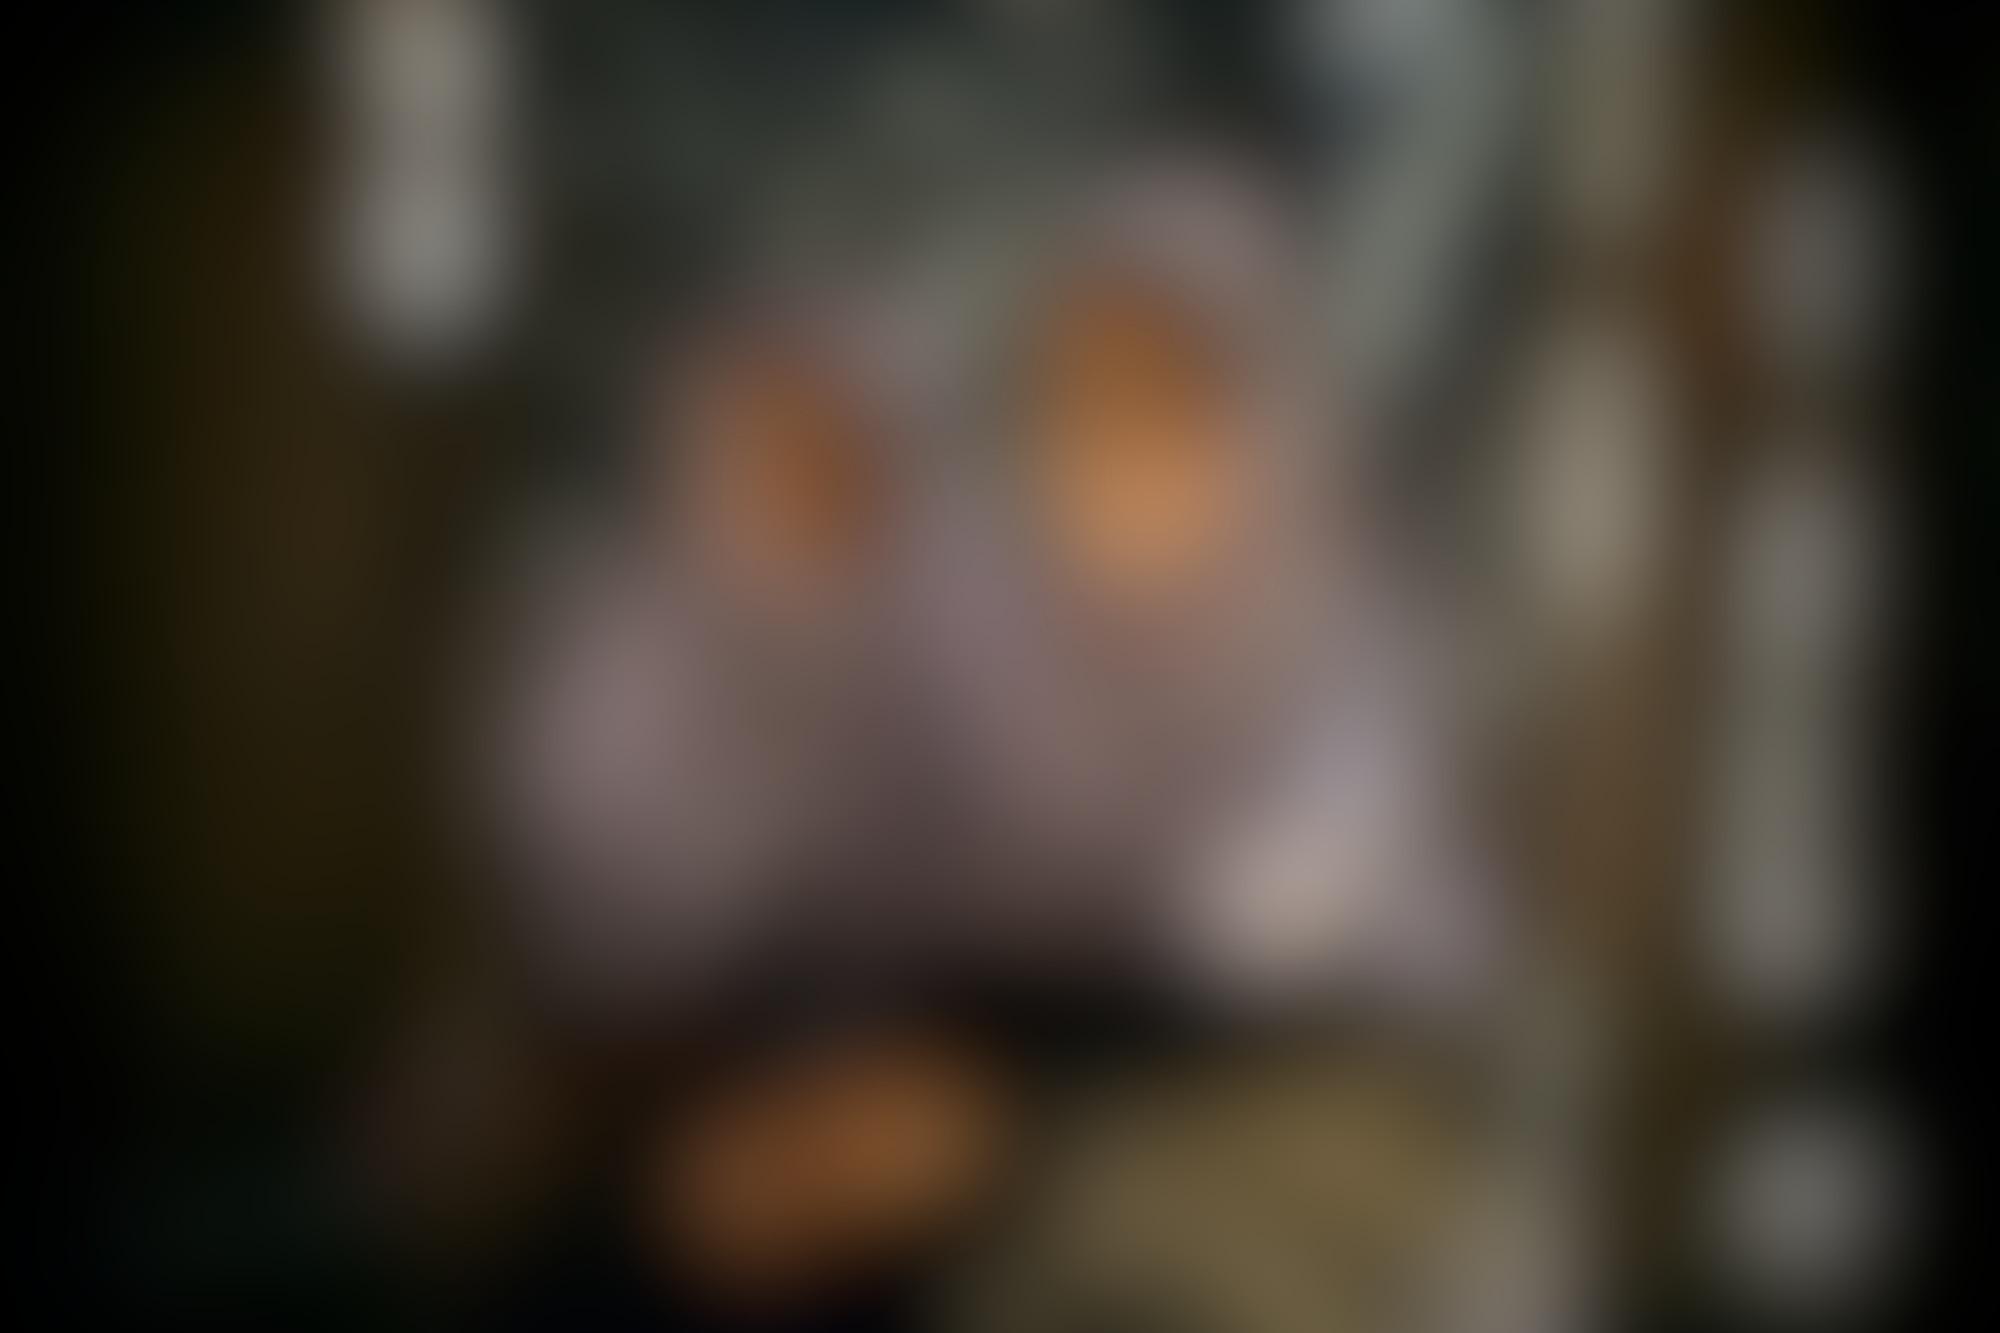 Souvid Datta Photojournalism 003 autocompressfitresizeixlibphp 1 1 0max h2000max w3 D2000q80s94fdc1af53e1d76ac705375d0d3c27b3